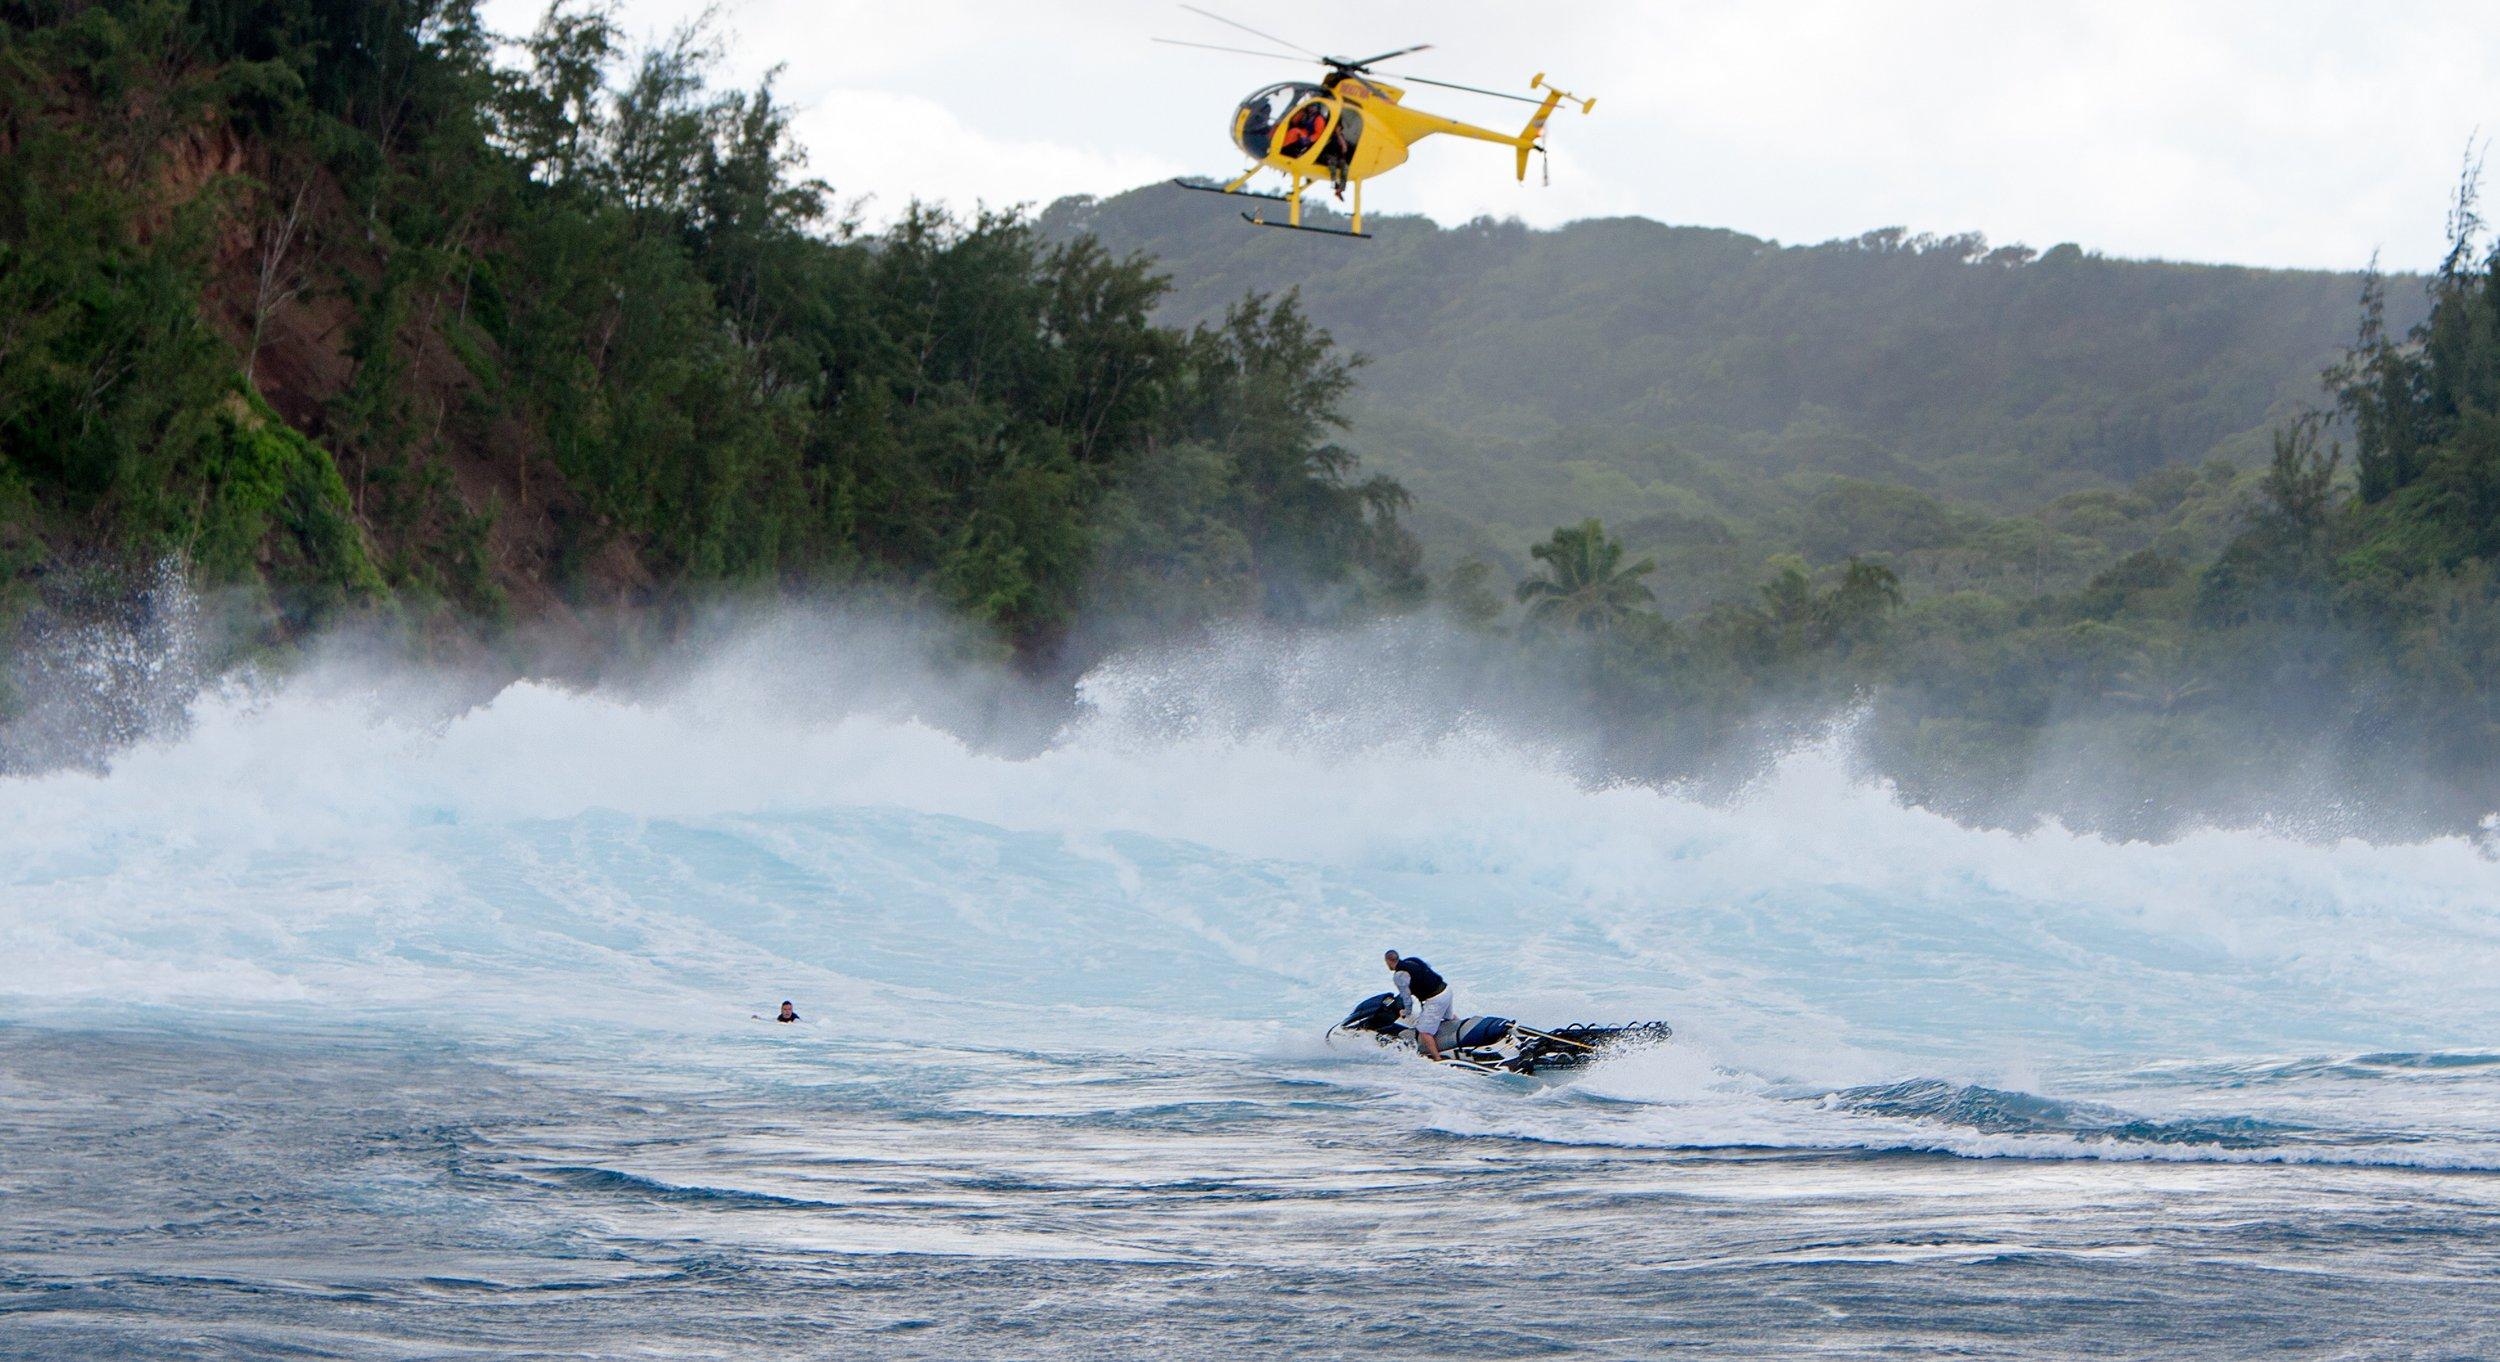 Find a Rescue Course. -